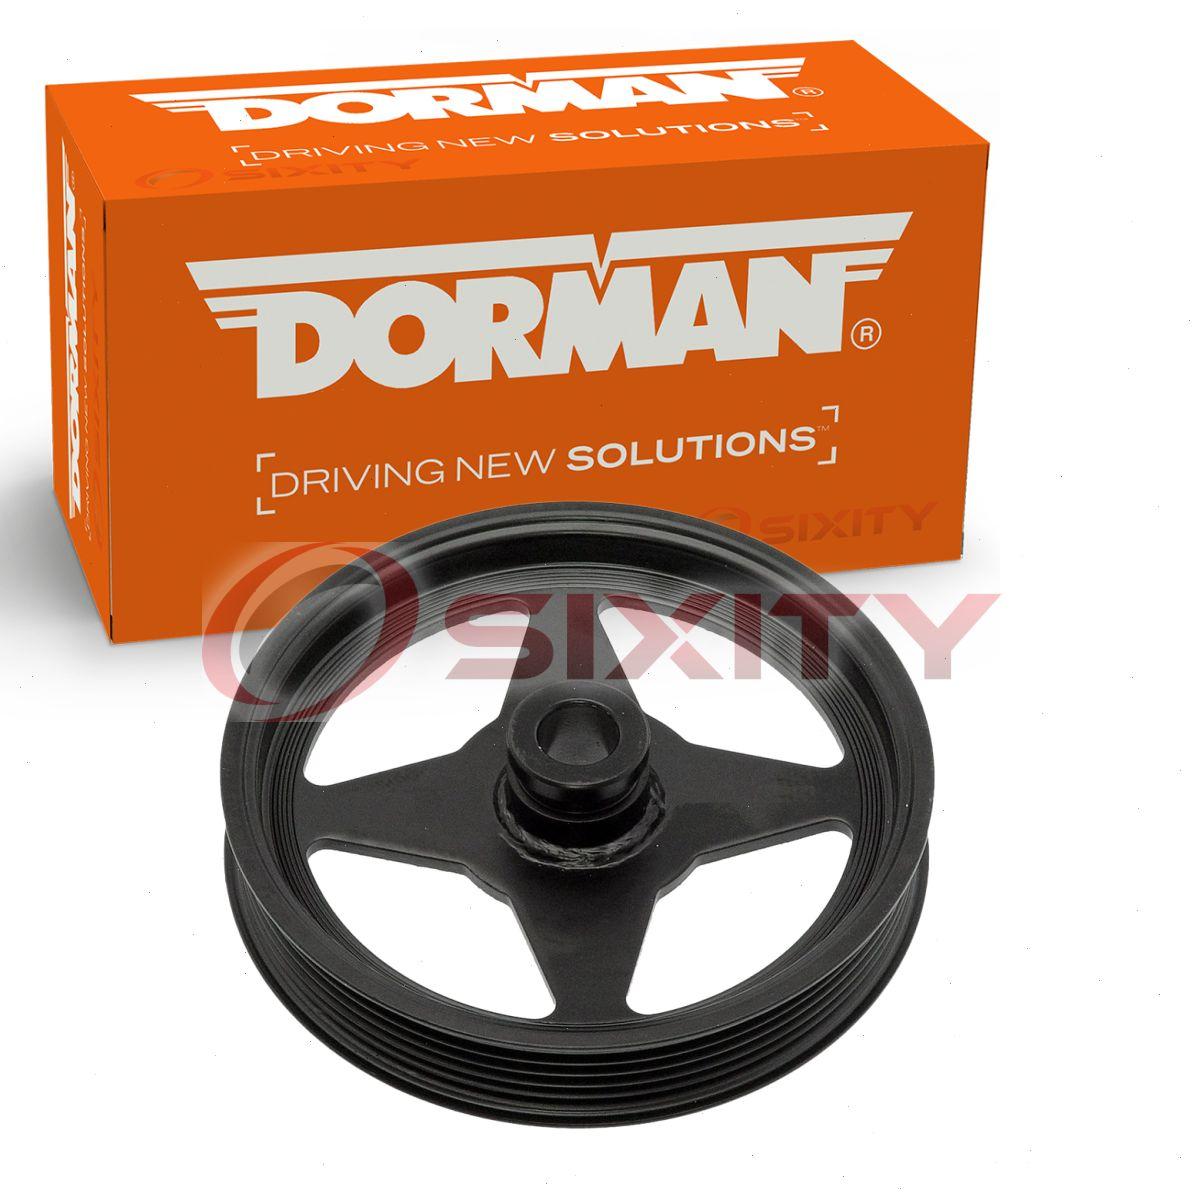 2010 Mercury Mountaineer Suspension: Dorman Power Steering Pump Pulley For Mercury Mountaineer